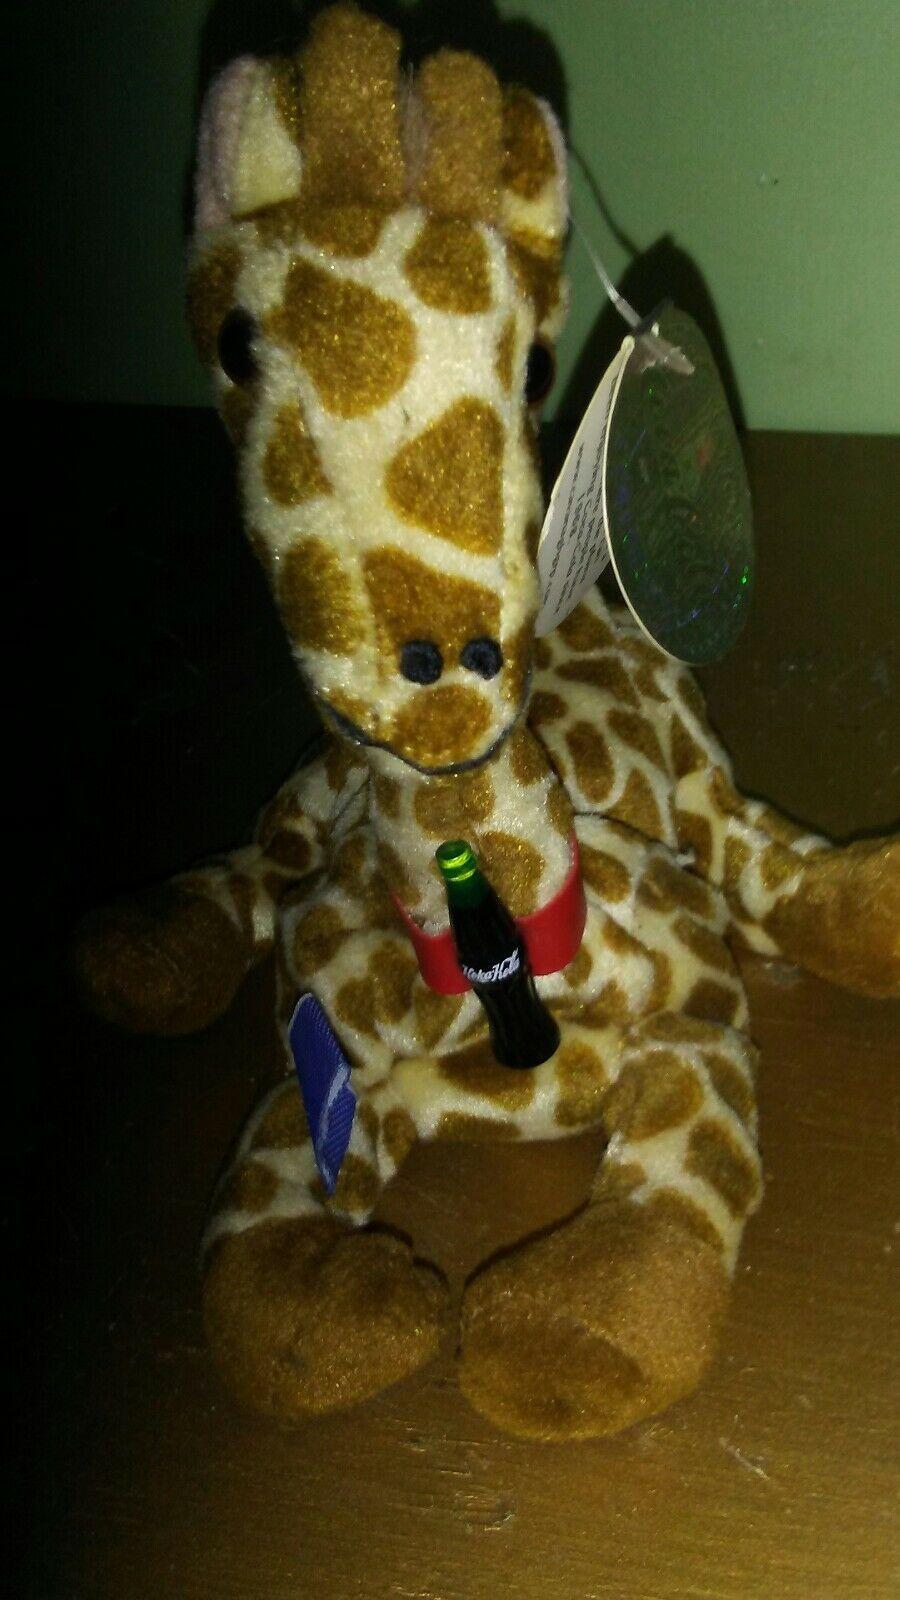 RIFRAFF Giraffe Somalia International Coca Cola Collection Beanbag Plush 1999 - $9.99